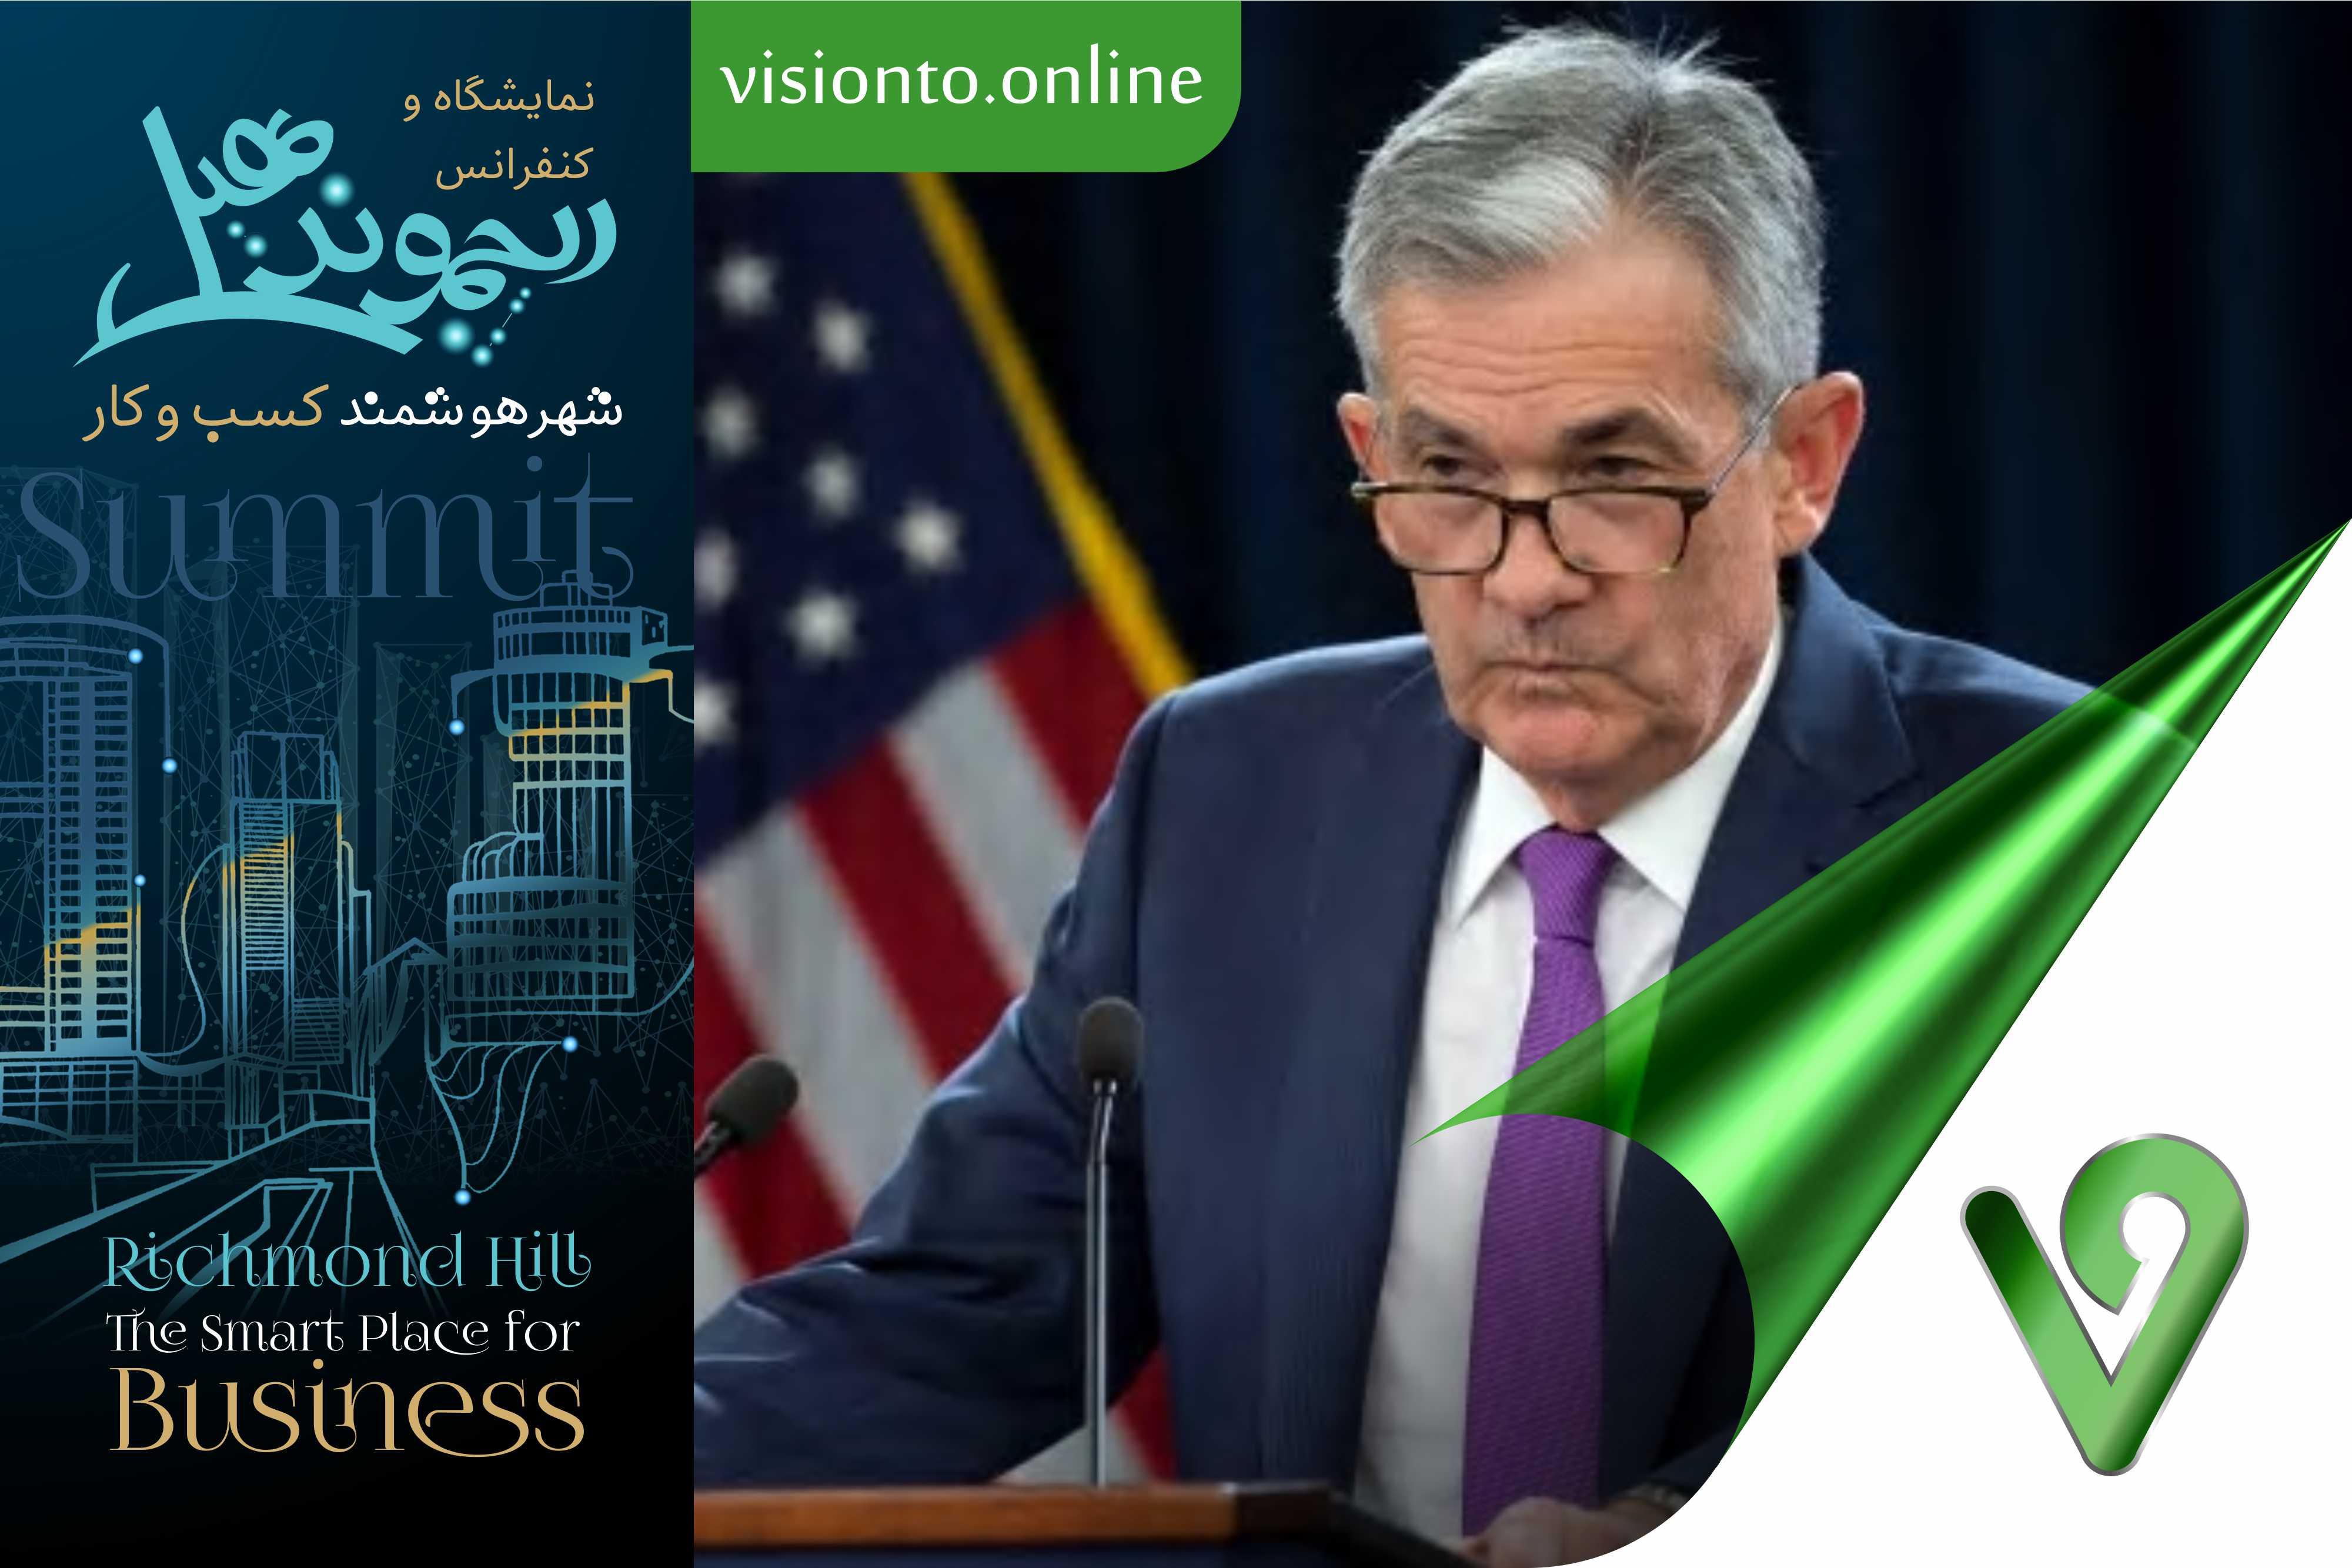 Photo of رئیس بانک مرکزی آمریکا در مورد وضعیت مسکن کانادا هشدار داد